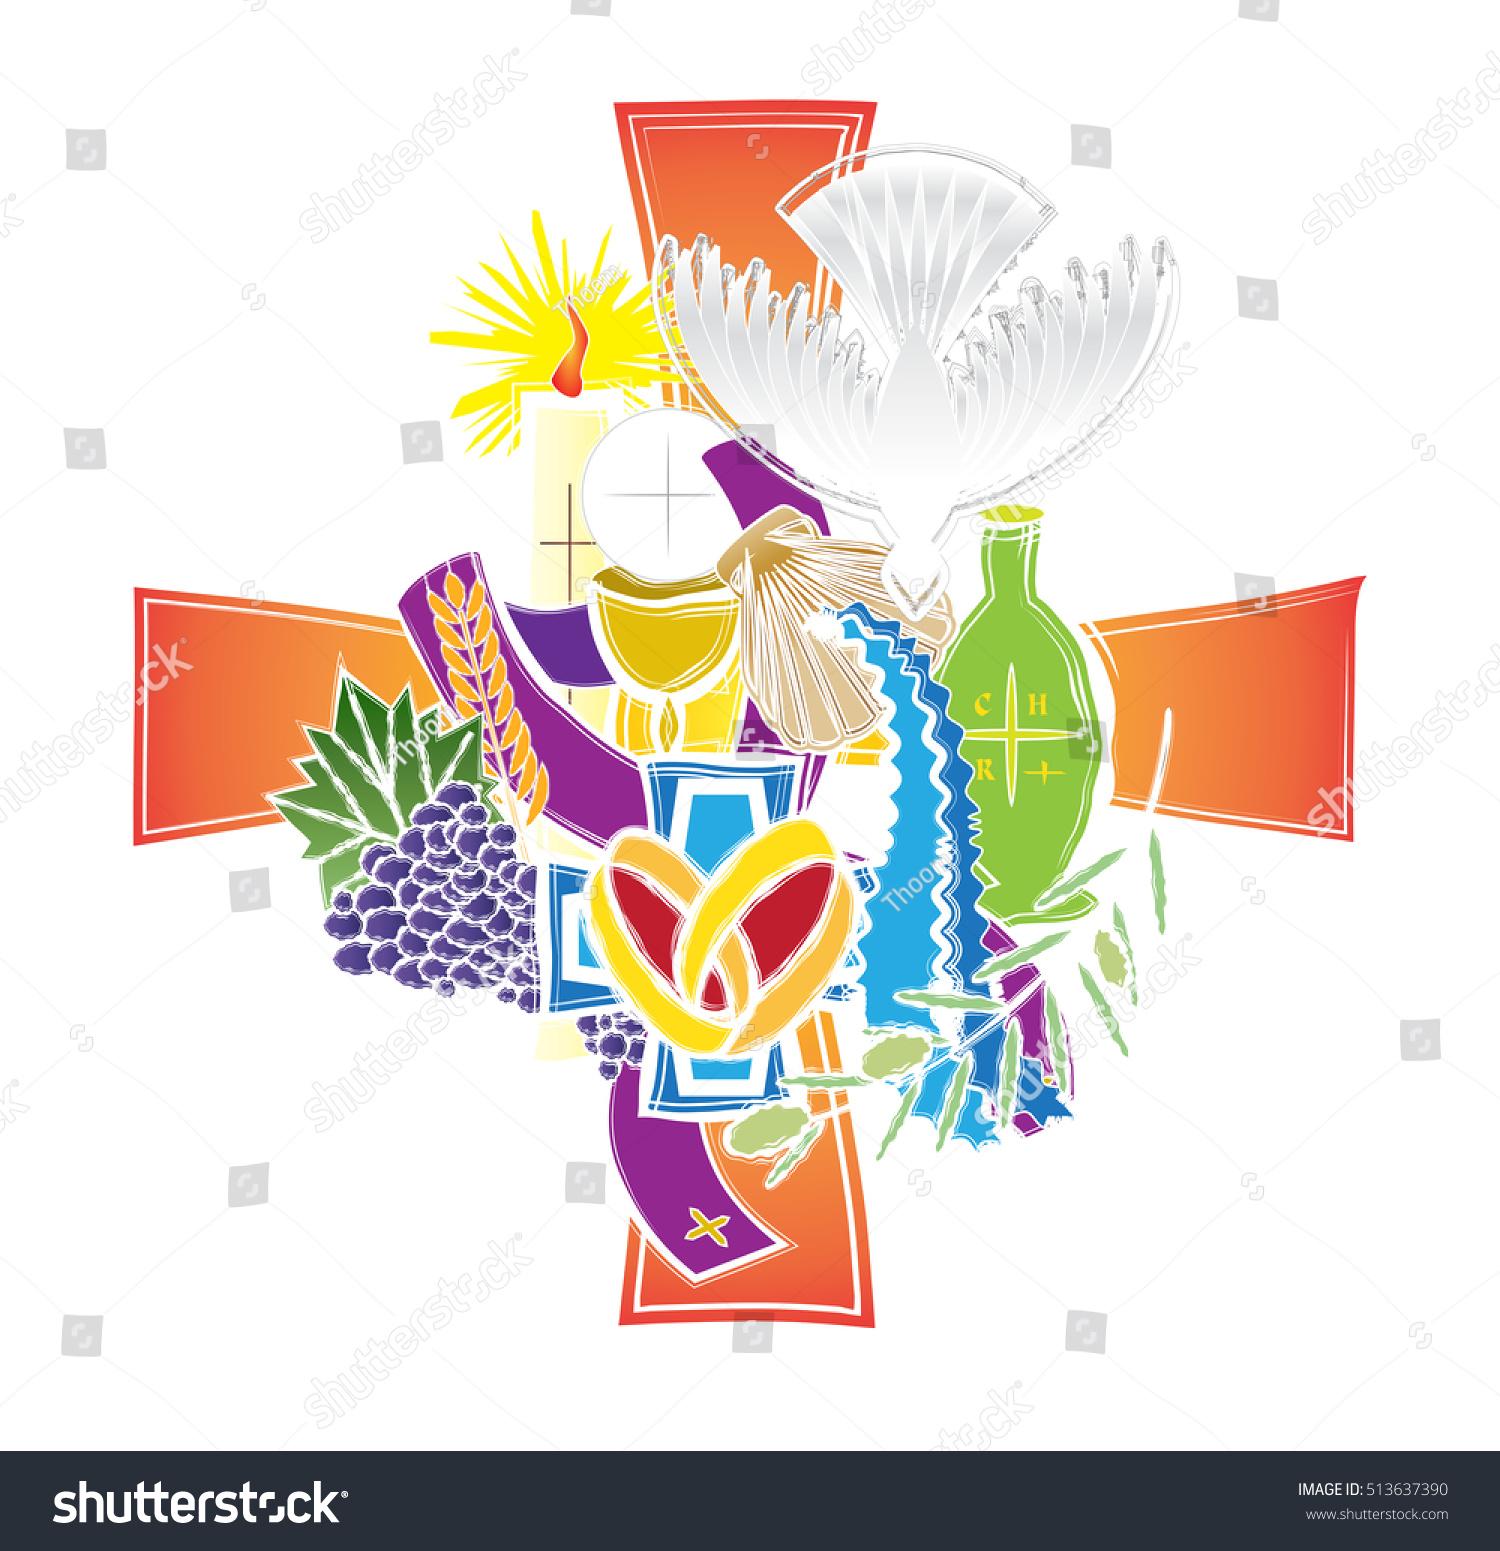 Symbols Seven Sacraments Catholic Church Abstract Stock